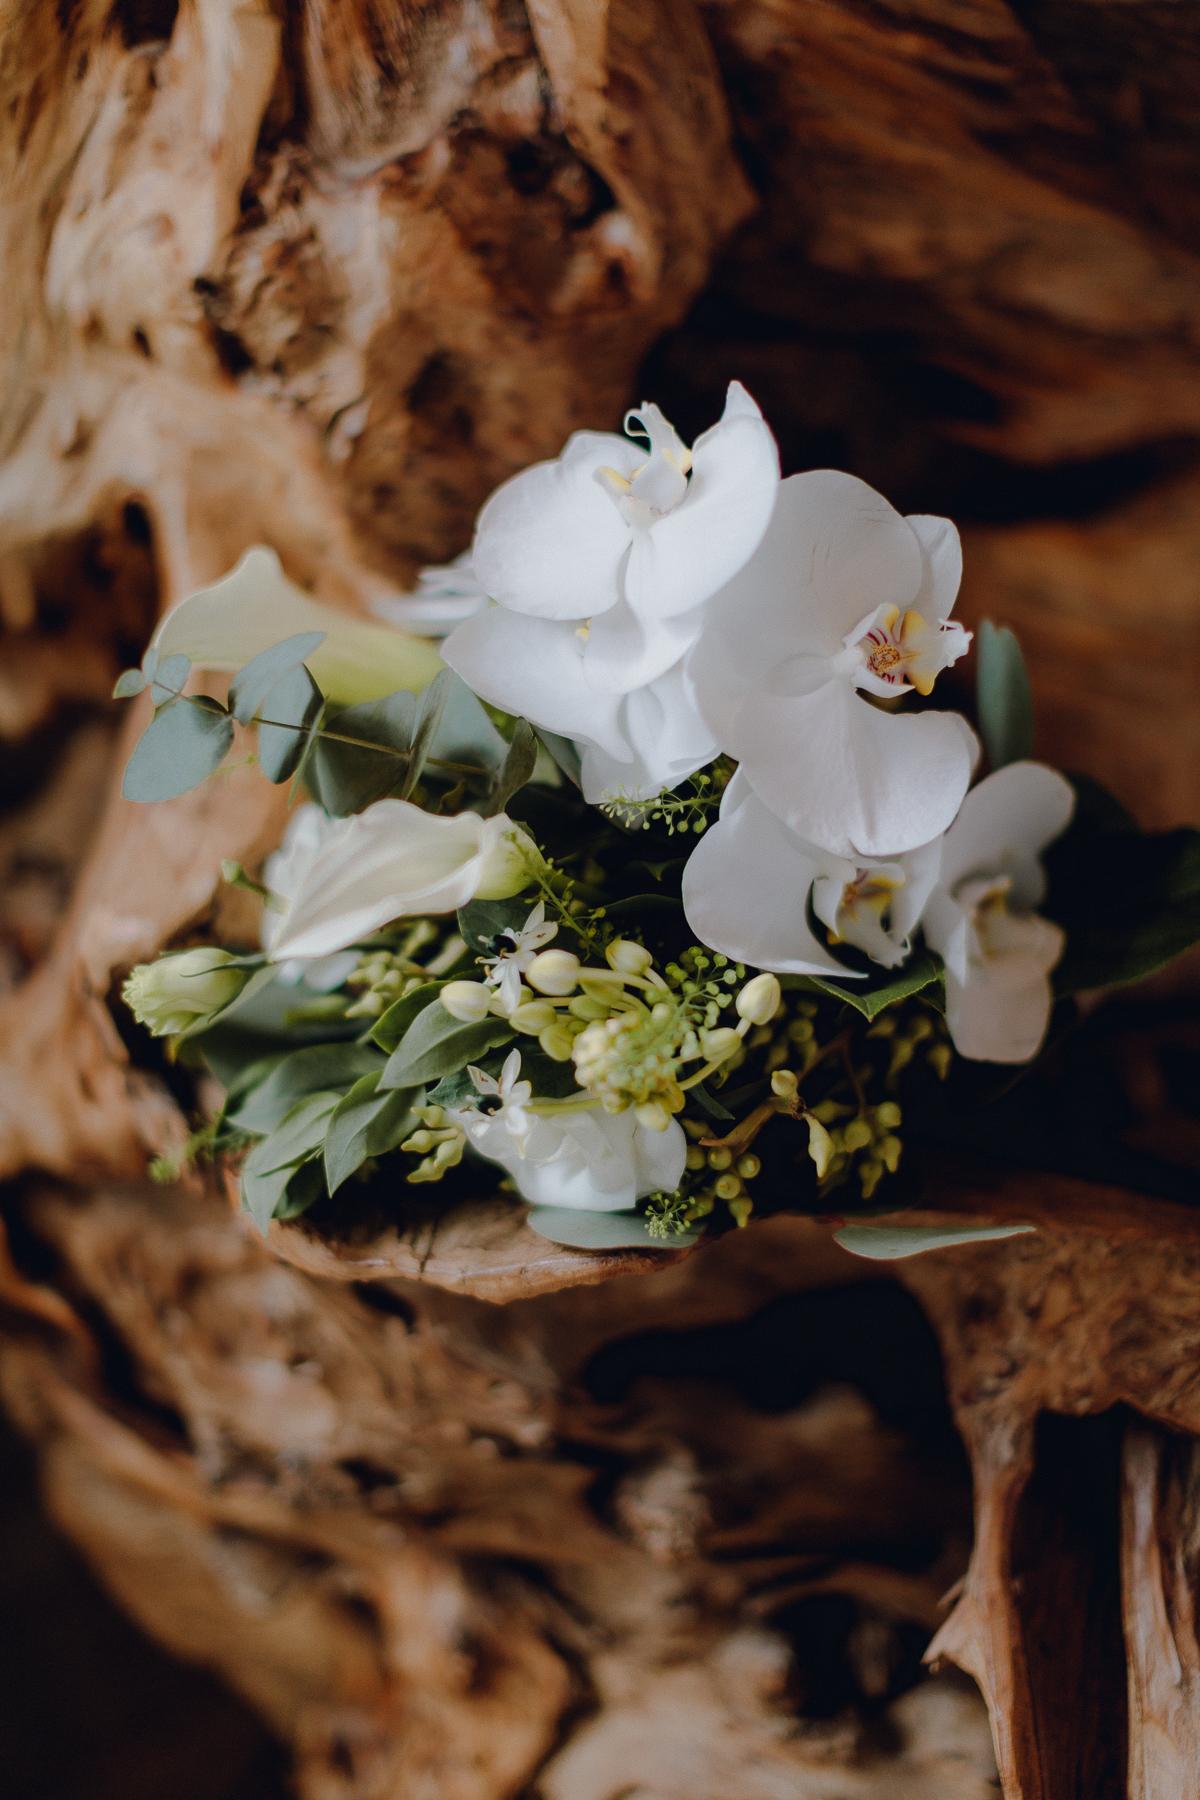 cannoe-restaurannt-wedding 0001.jpg